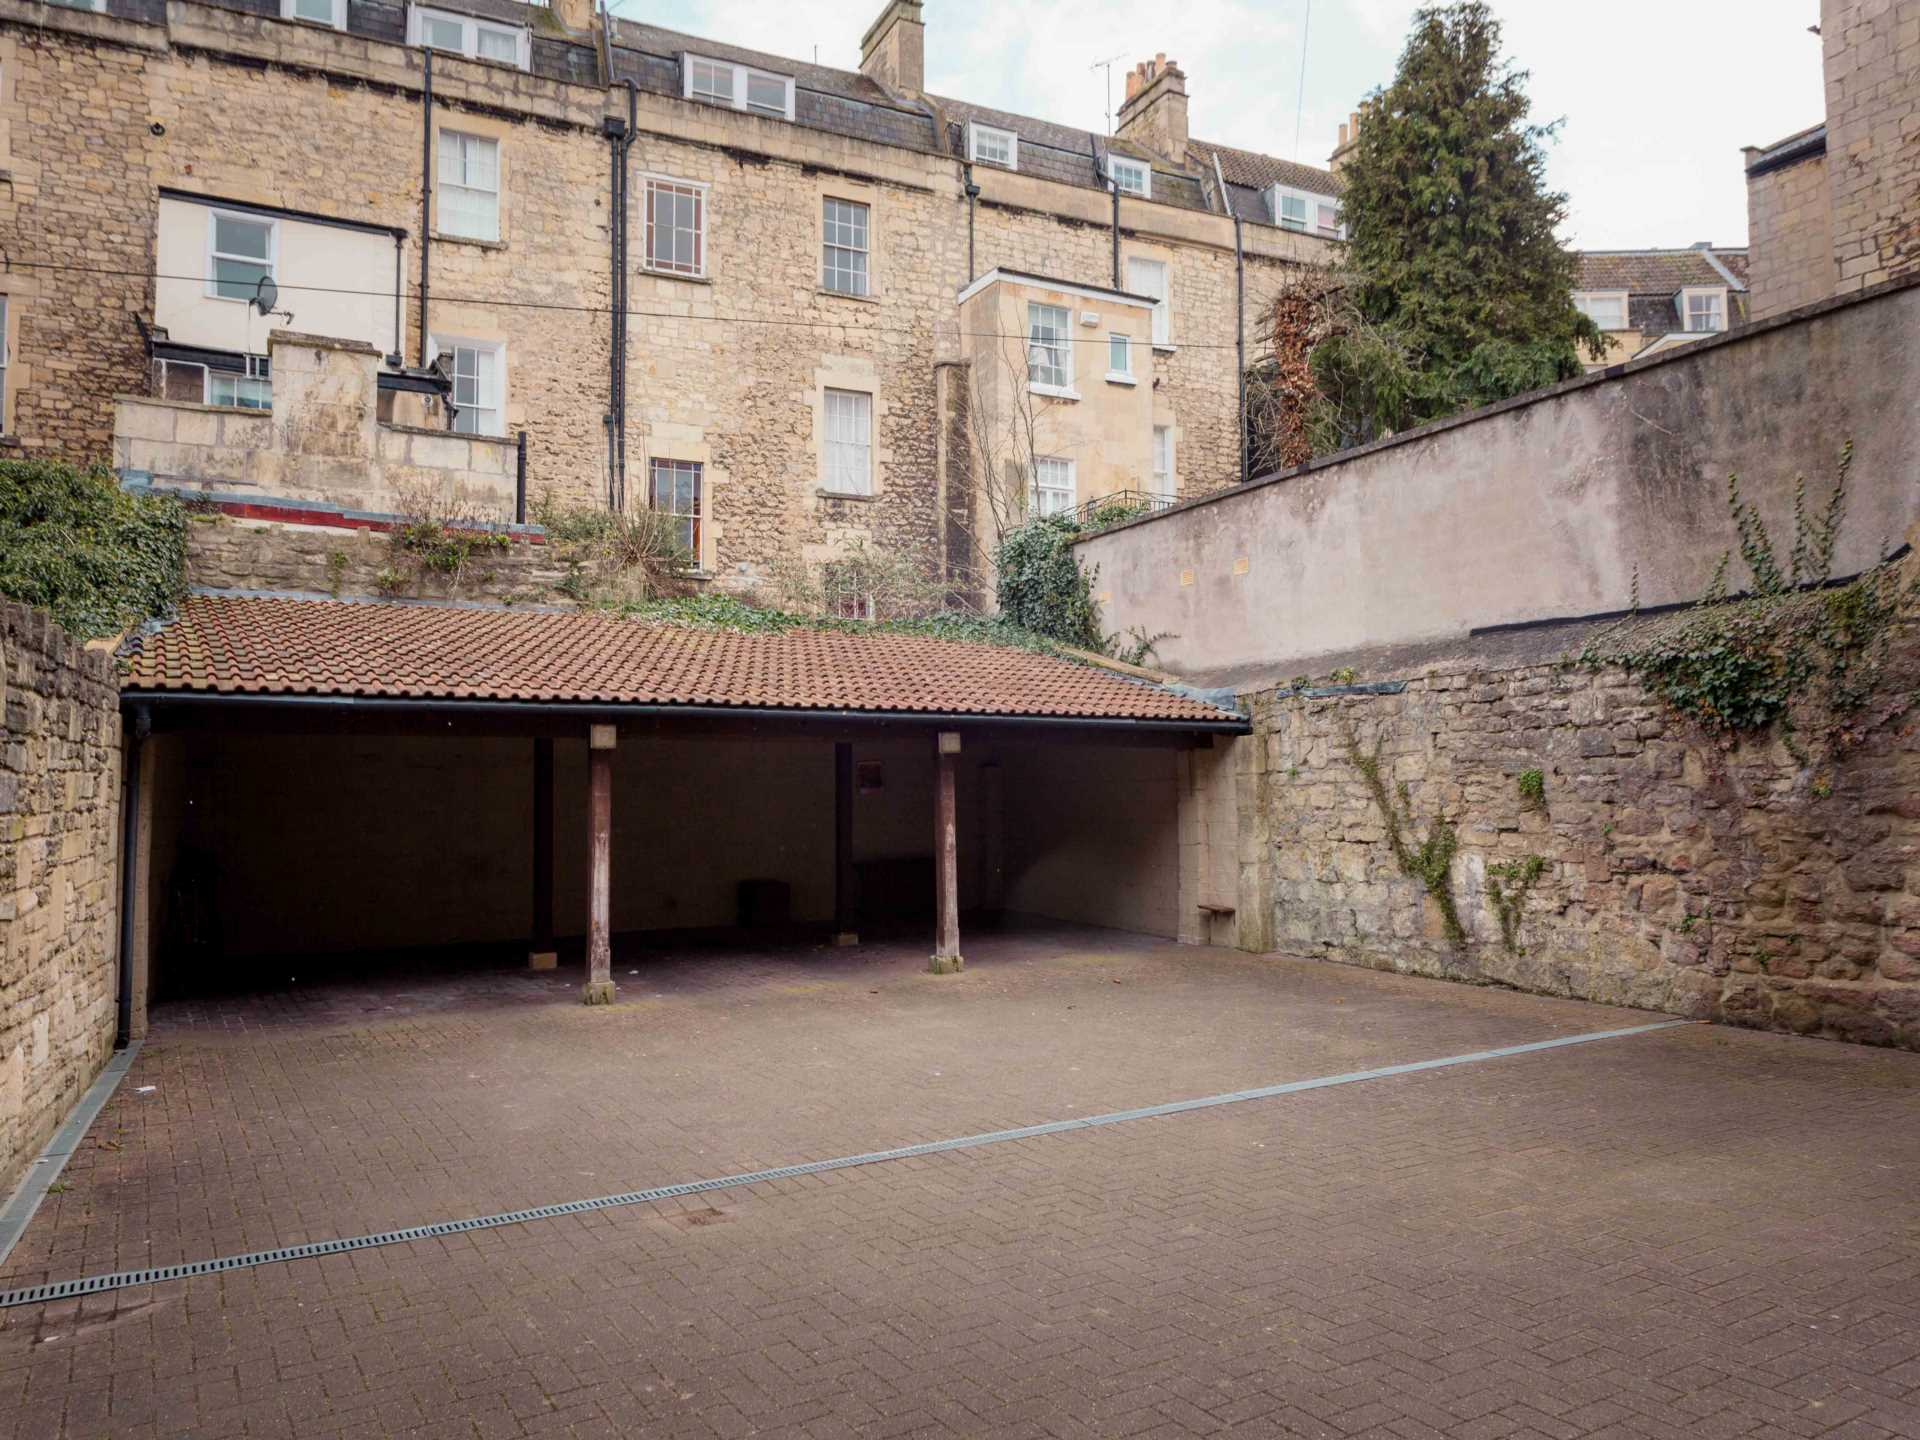 Grove Street, Bath, Image 8